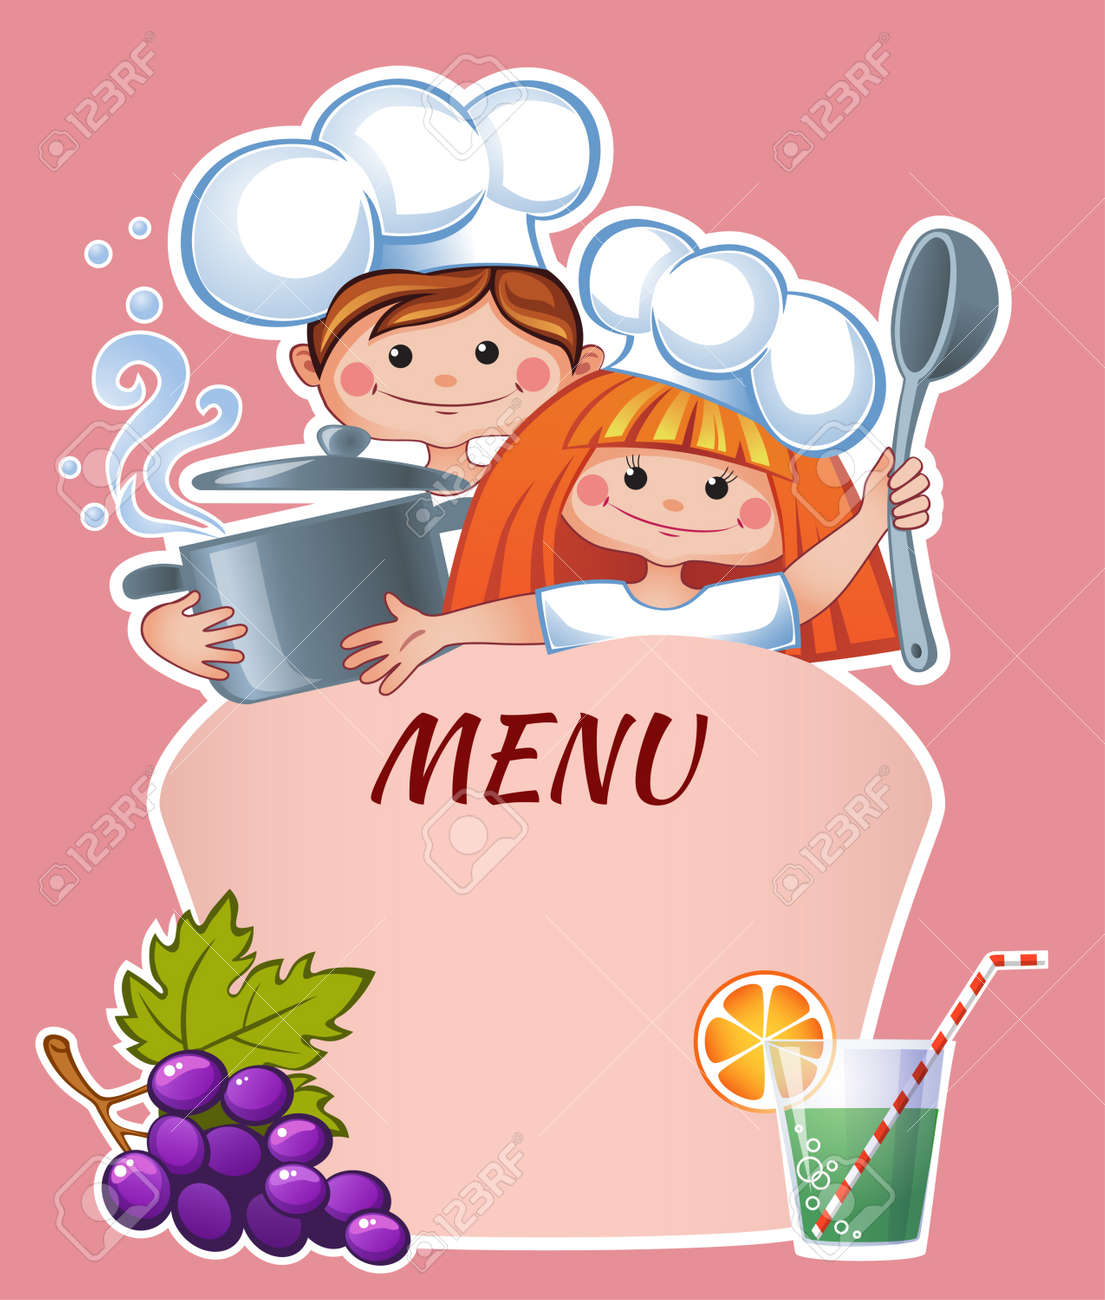 Menu Templates For Kids editable baby shower invitations timesheet – Kids Menu Templates